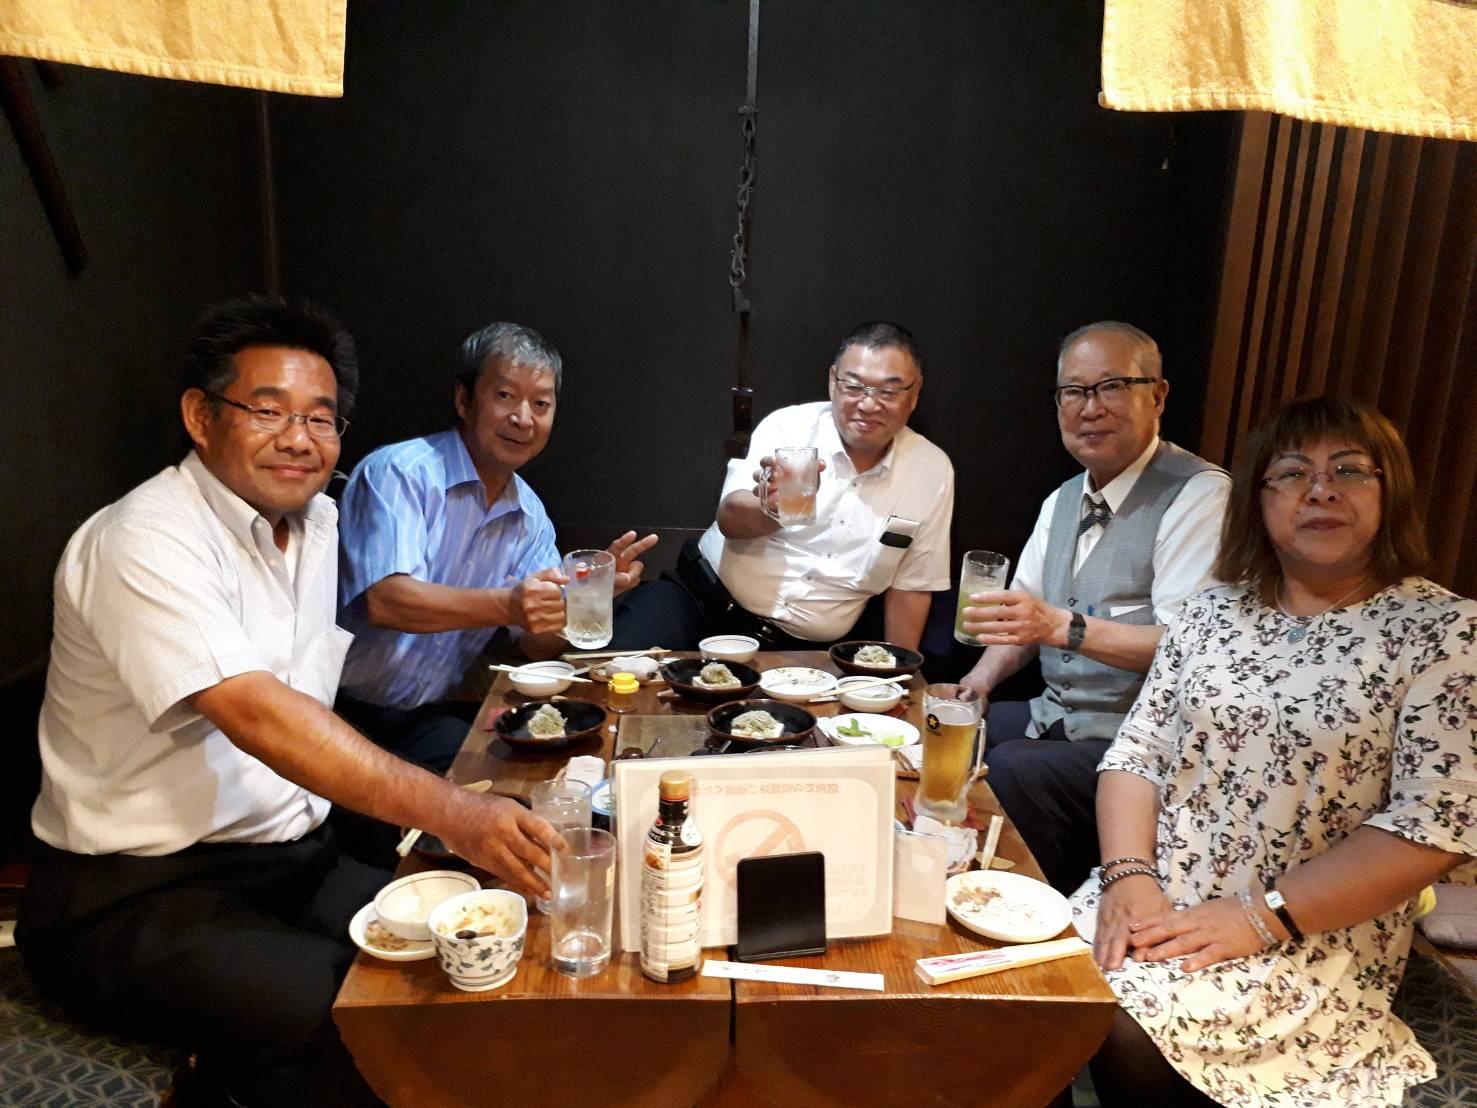 福島PHP松下幸之助経営を学ぶ会役員懇談会20180731